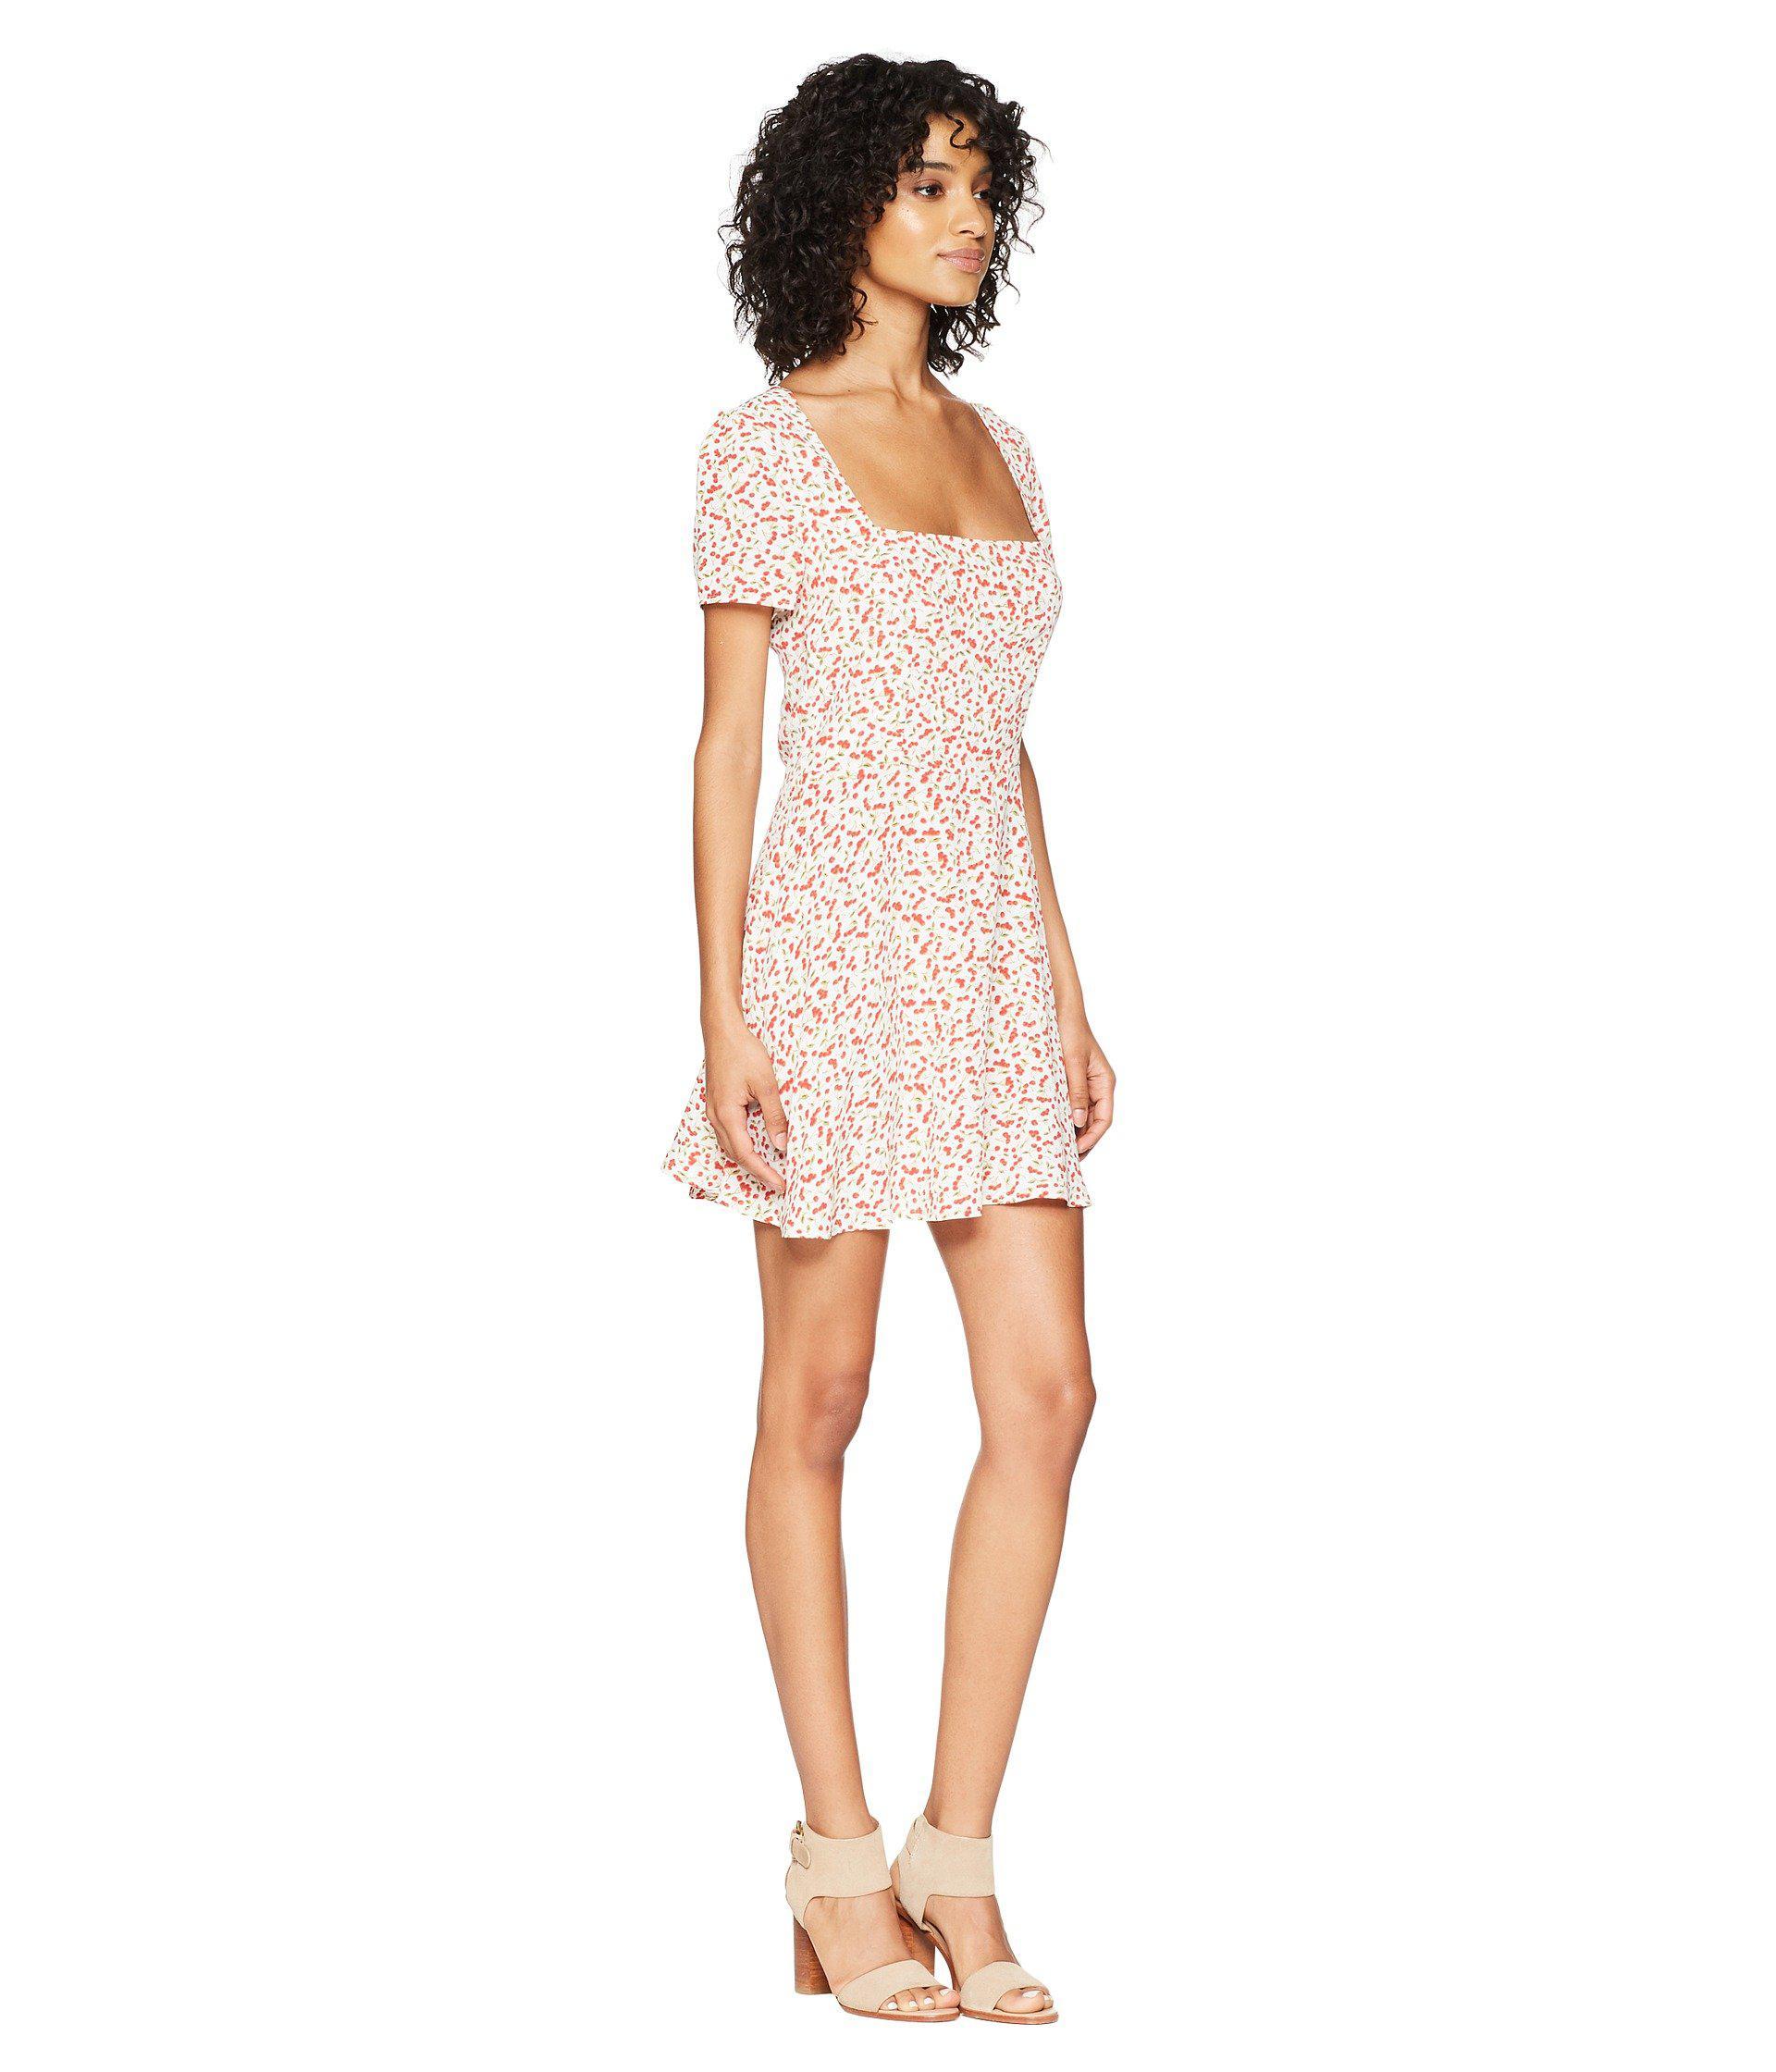 a6507b6bda16 Flynn Skye Maiden Mini Dress in Pink - Lyst